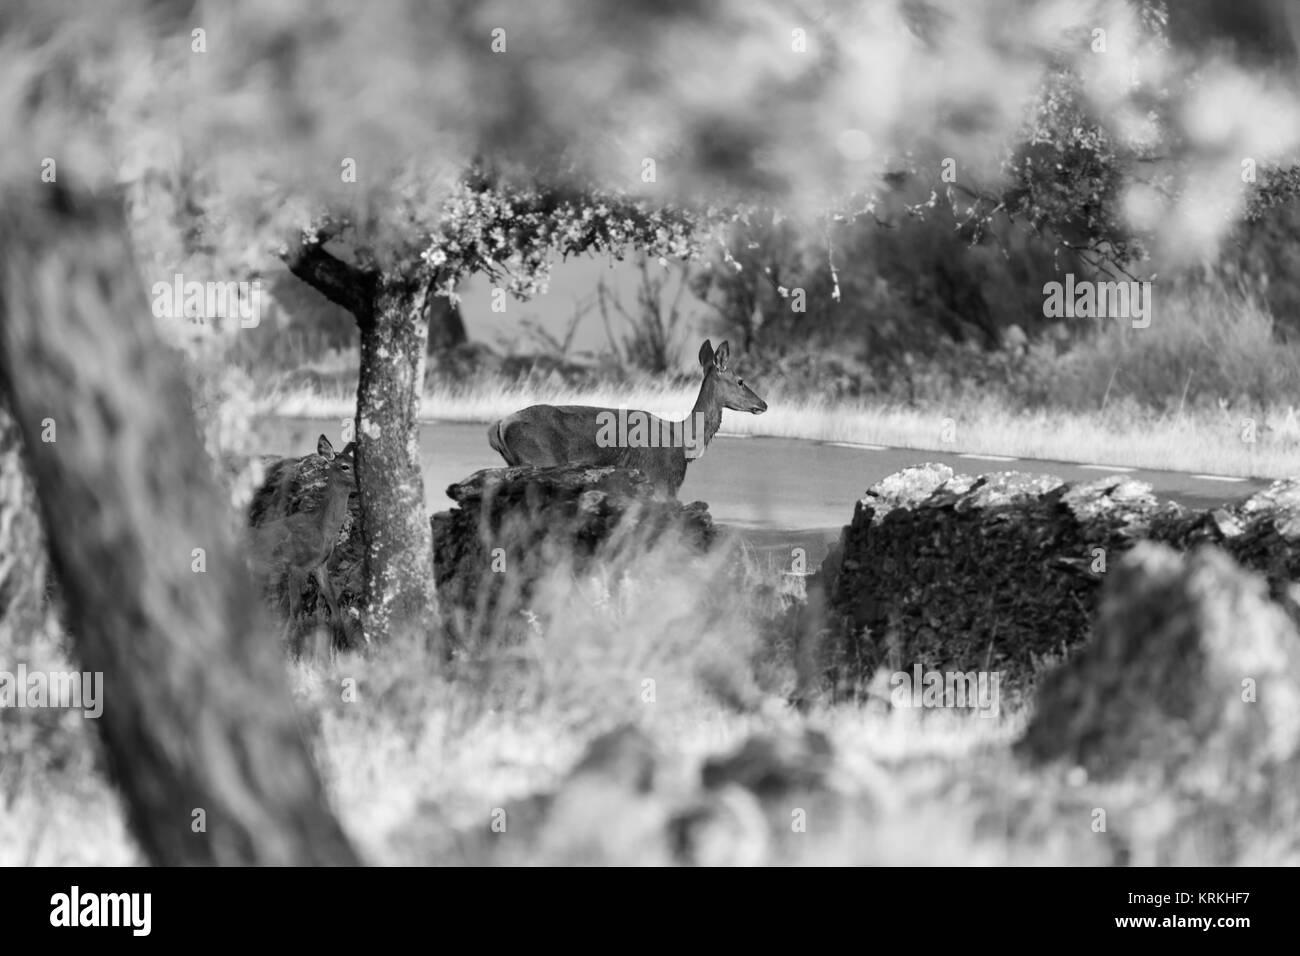 Cervatillos cerca de una carretera rural en el área natural de Granadilla. España. Imagen De Stock